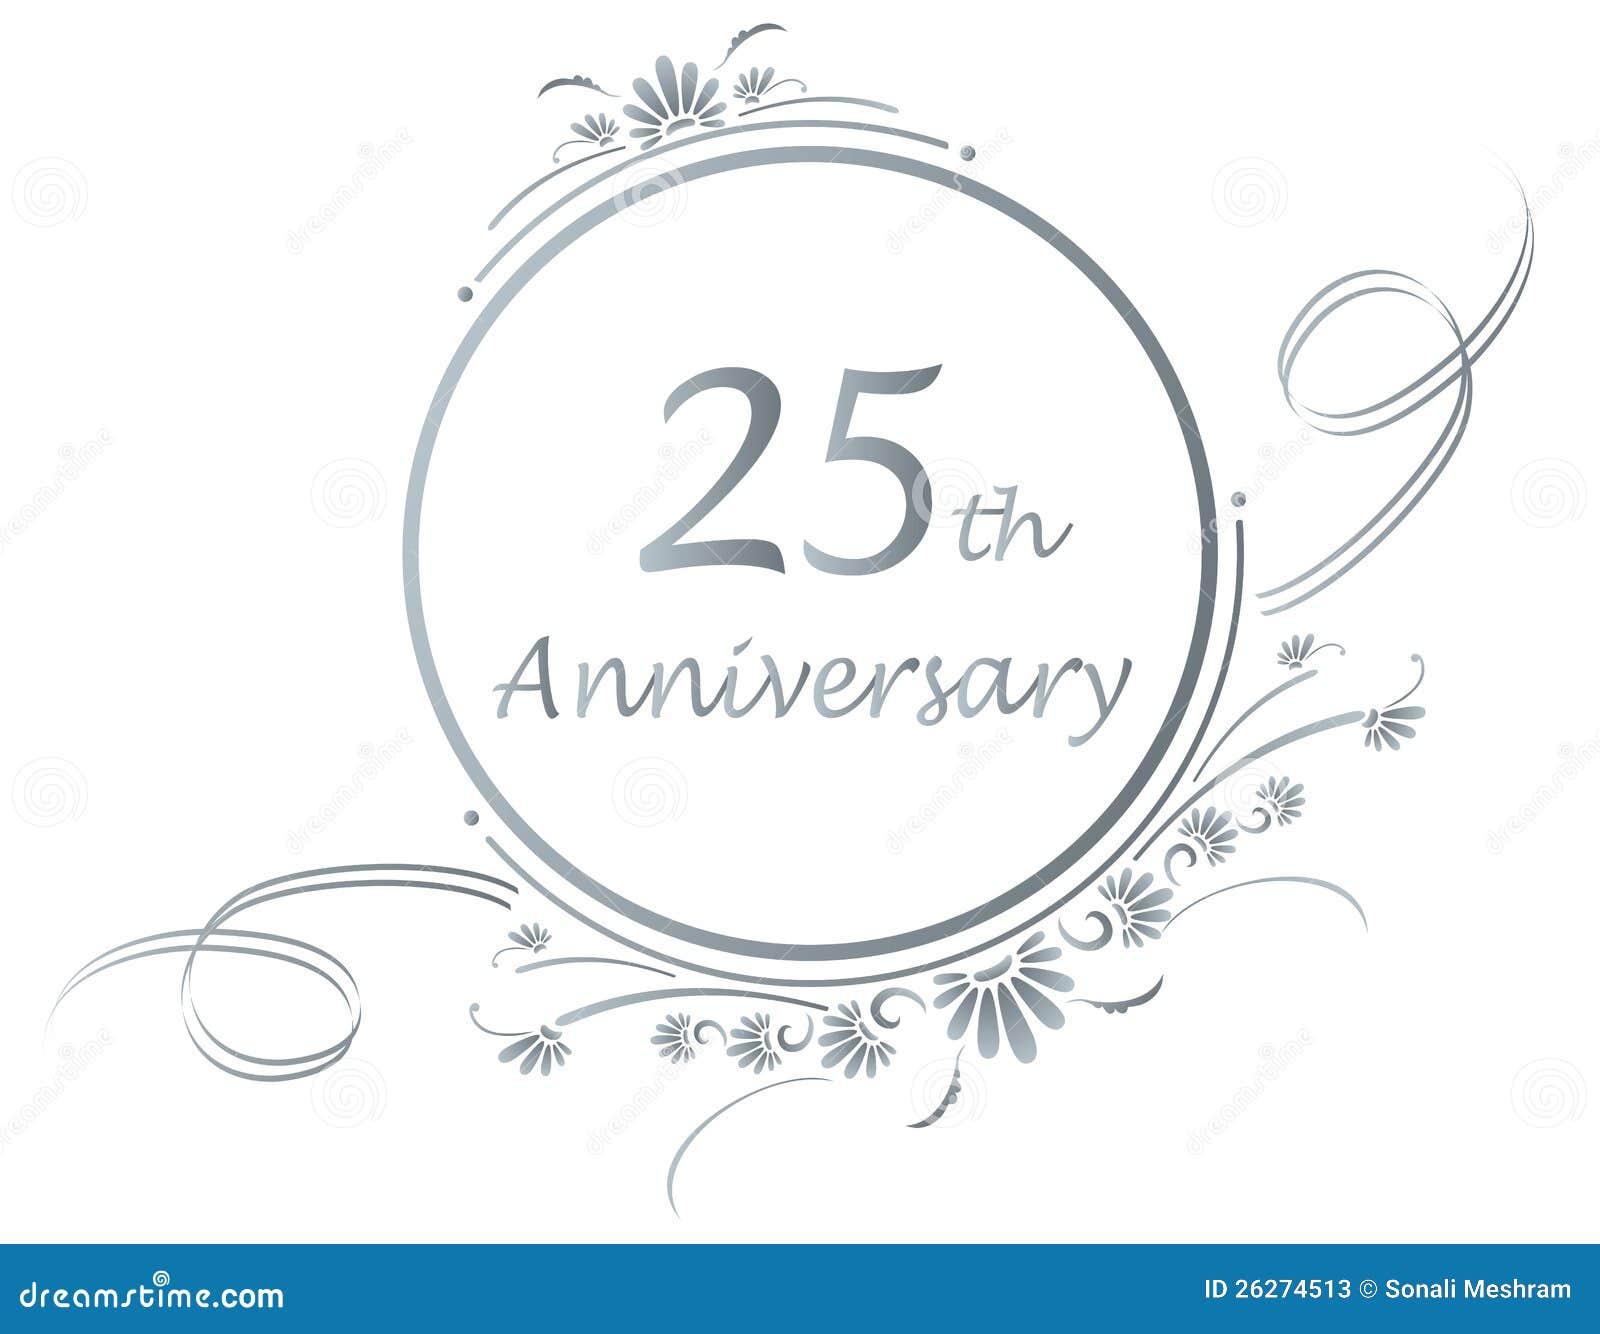 free silver wedding anniversary clipart - photo #16